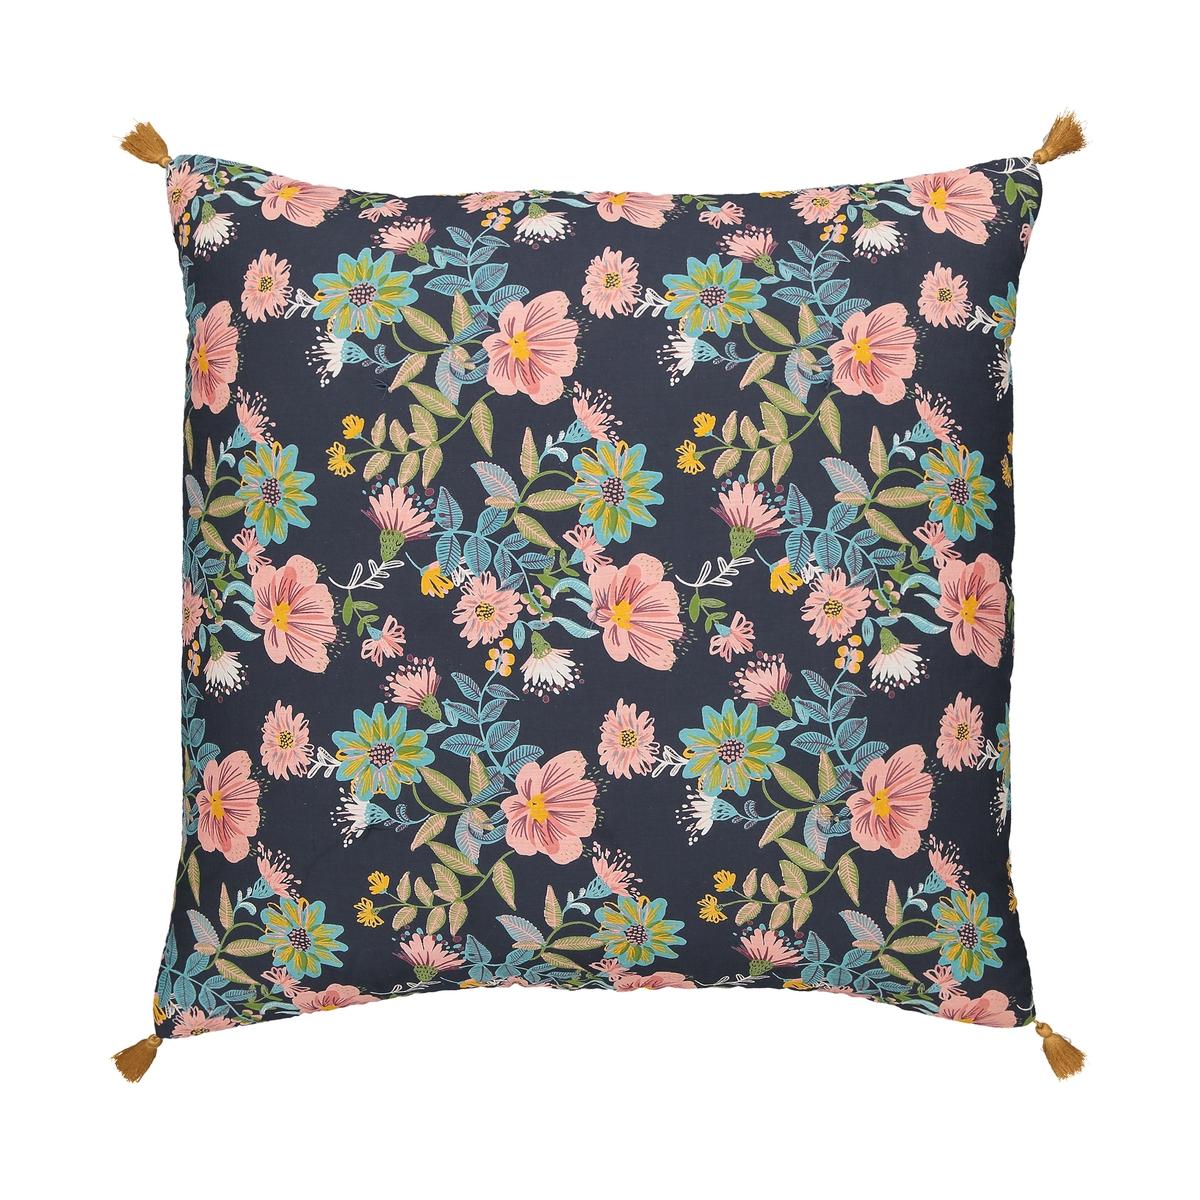 Чехол La Redoute На подушку с рисунком 65 x 65 см другие чехол la redoute для подушки или наволочка однотонного цвета с помпонами riad 65 x 65 см розовый